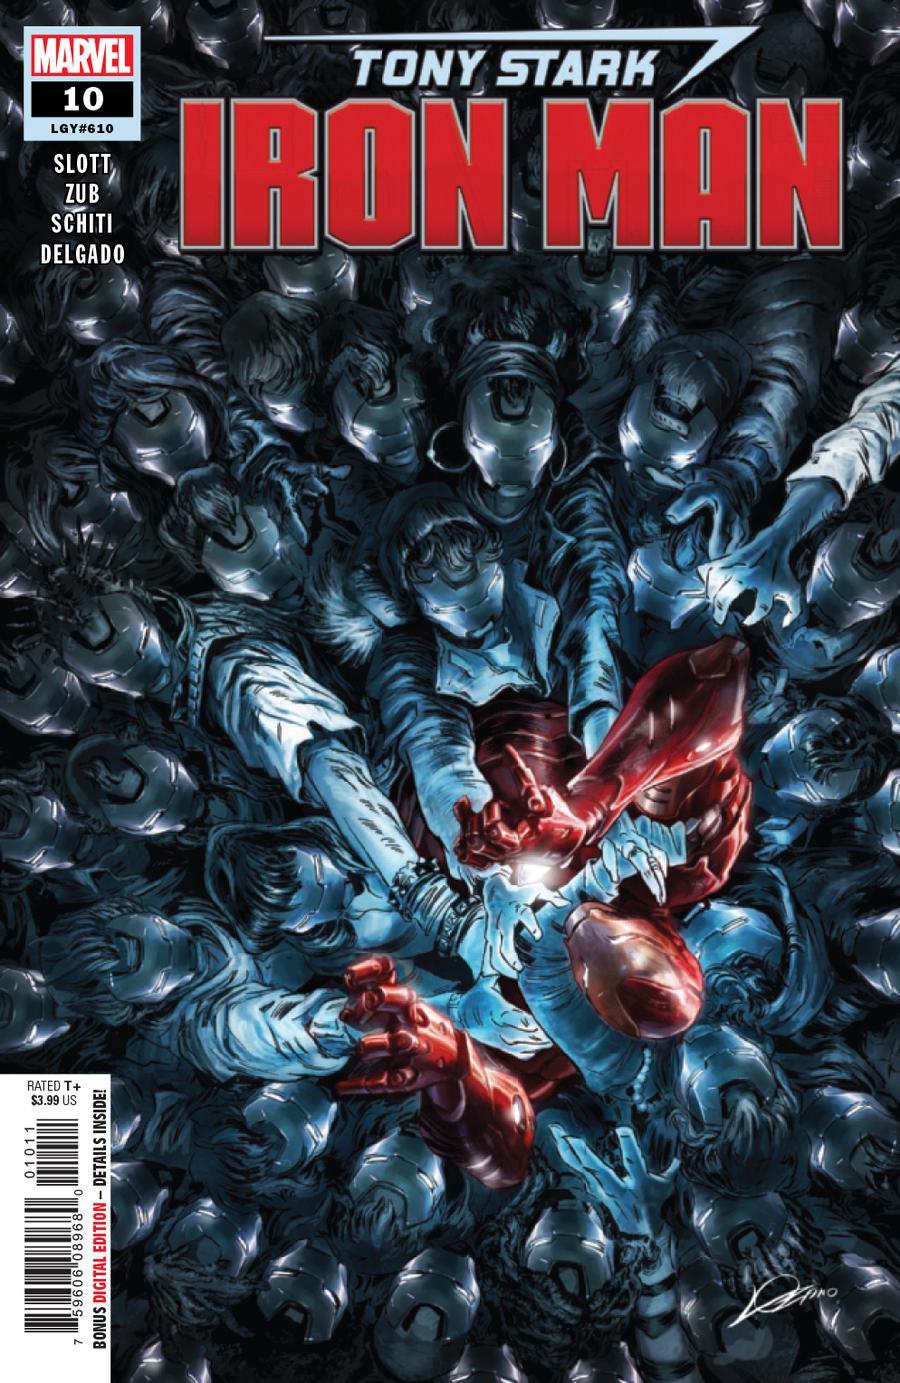 Tony Stark Iron Man #10 Cover A Regular Alexander Lozano Cover